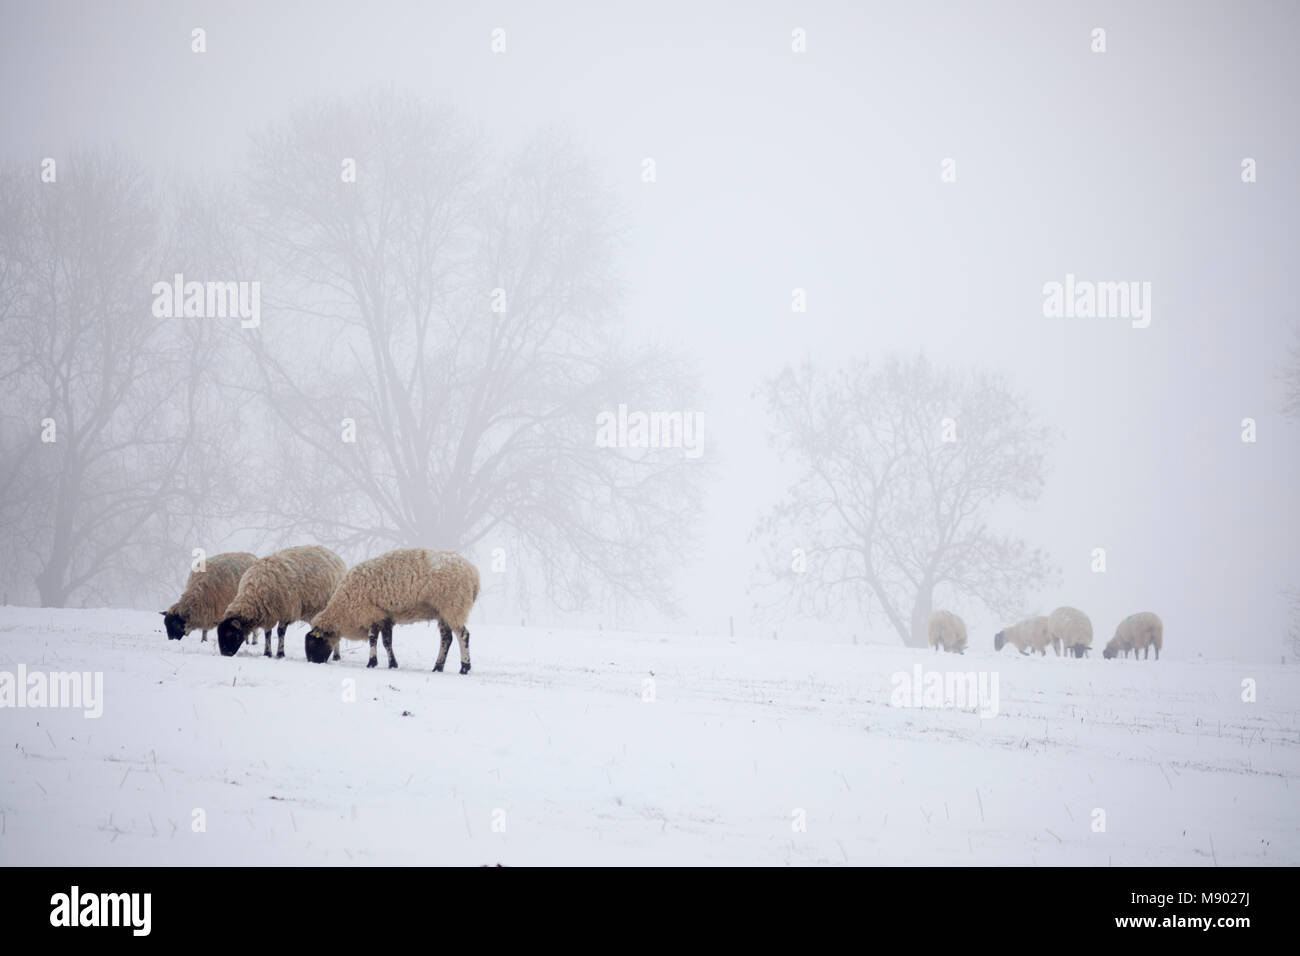 Moutons blancs en neige et brouillard, Chipping Campden, les Cotswolds, Gloucestershire, Angleterre, Royaume-Uni, Photo Stock